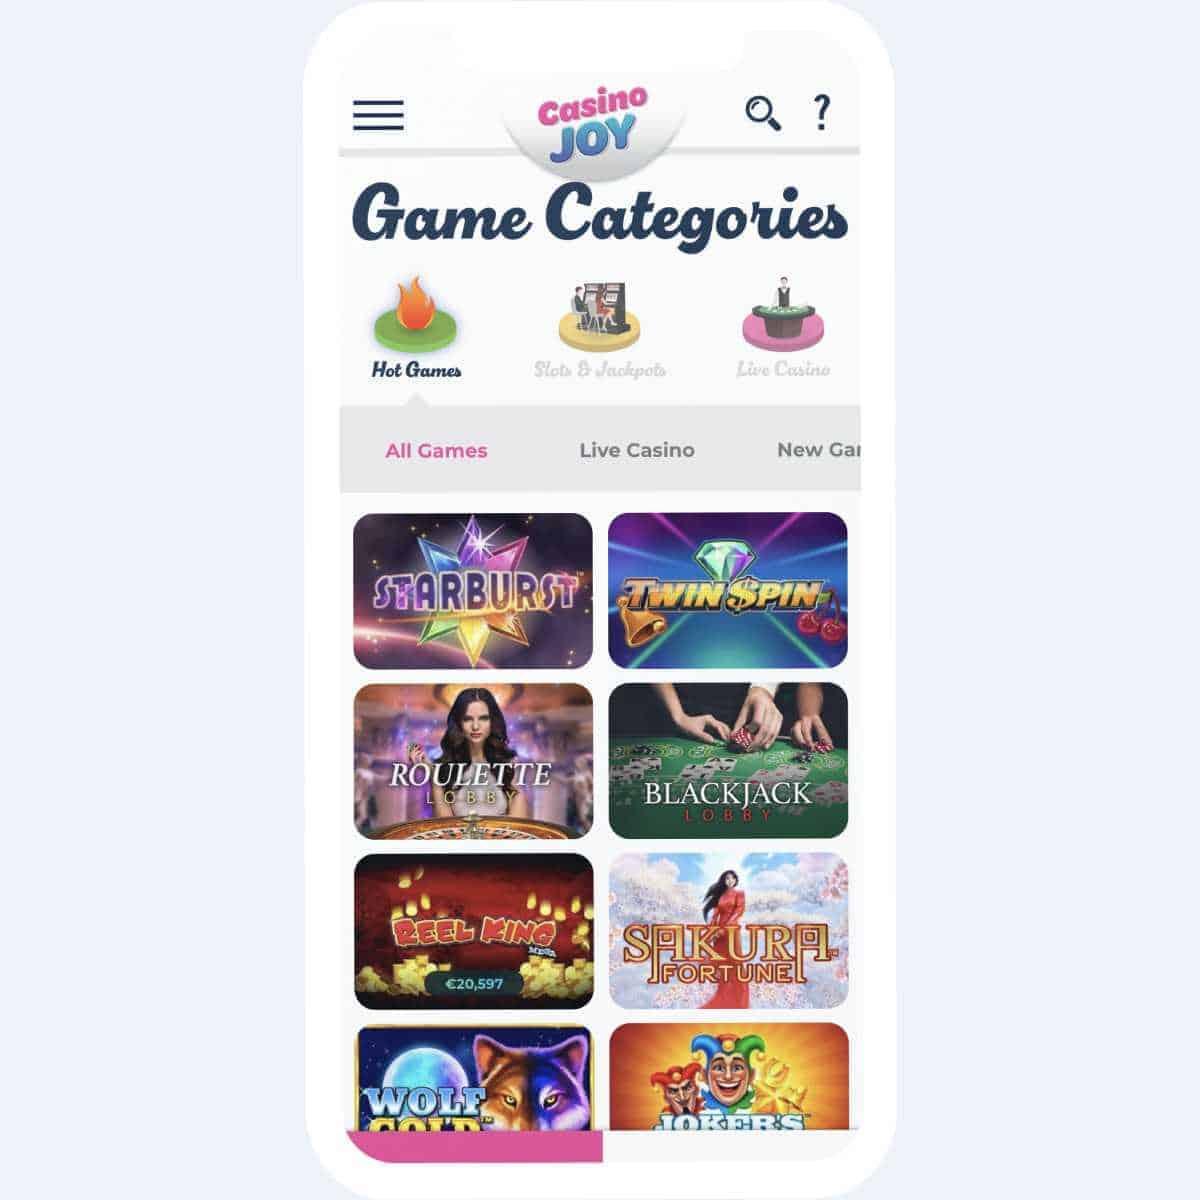 Casino Joy game categories